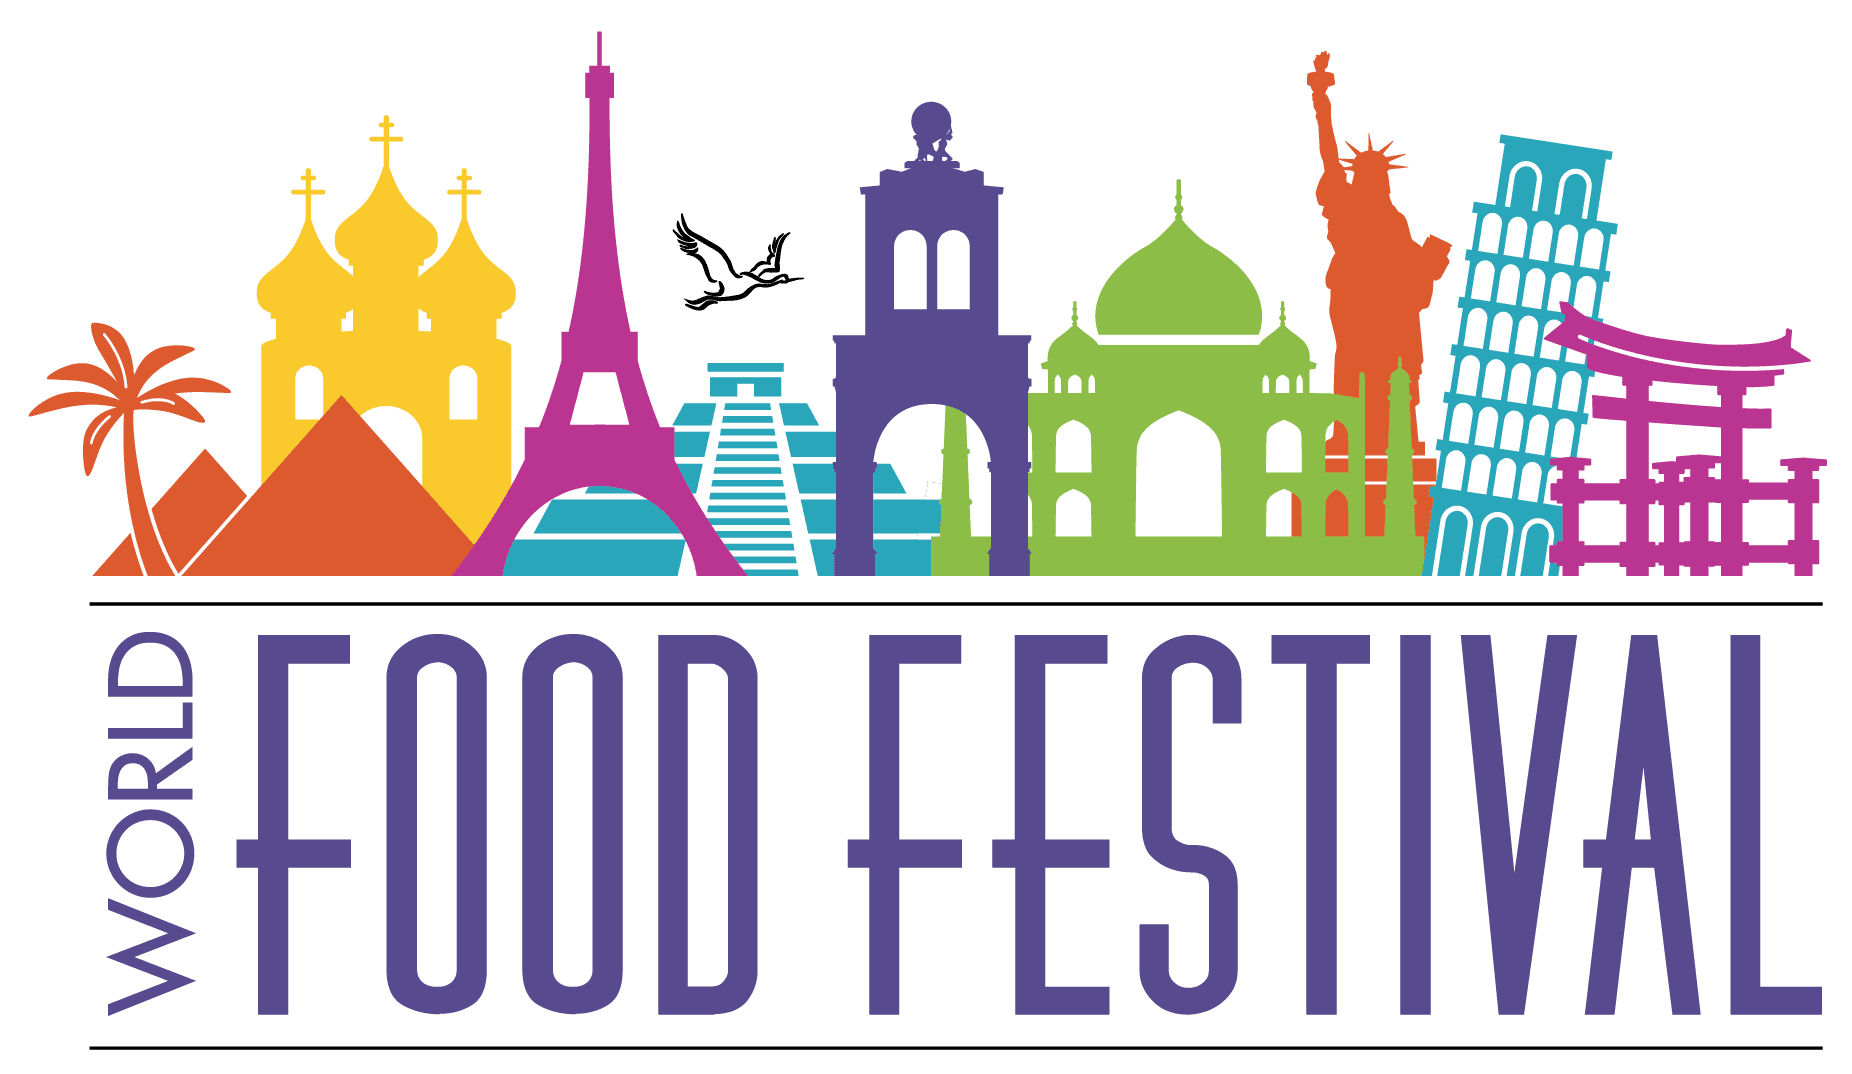 World food altamonte springs. Diversity clipart cultural festival